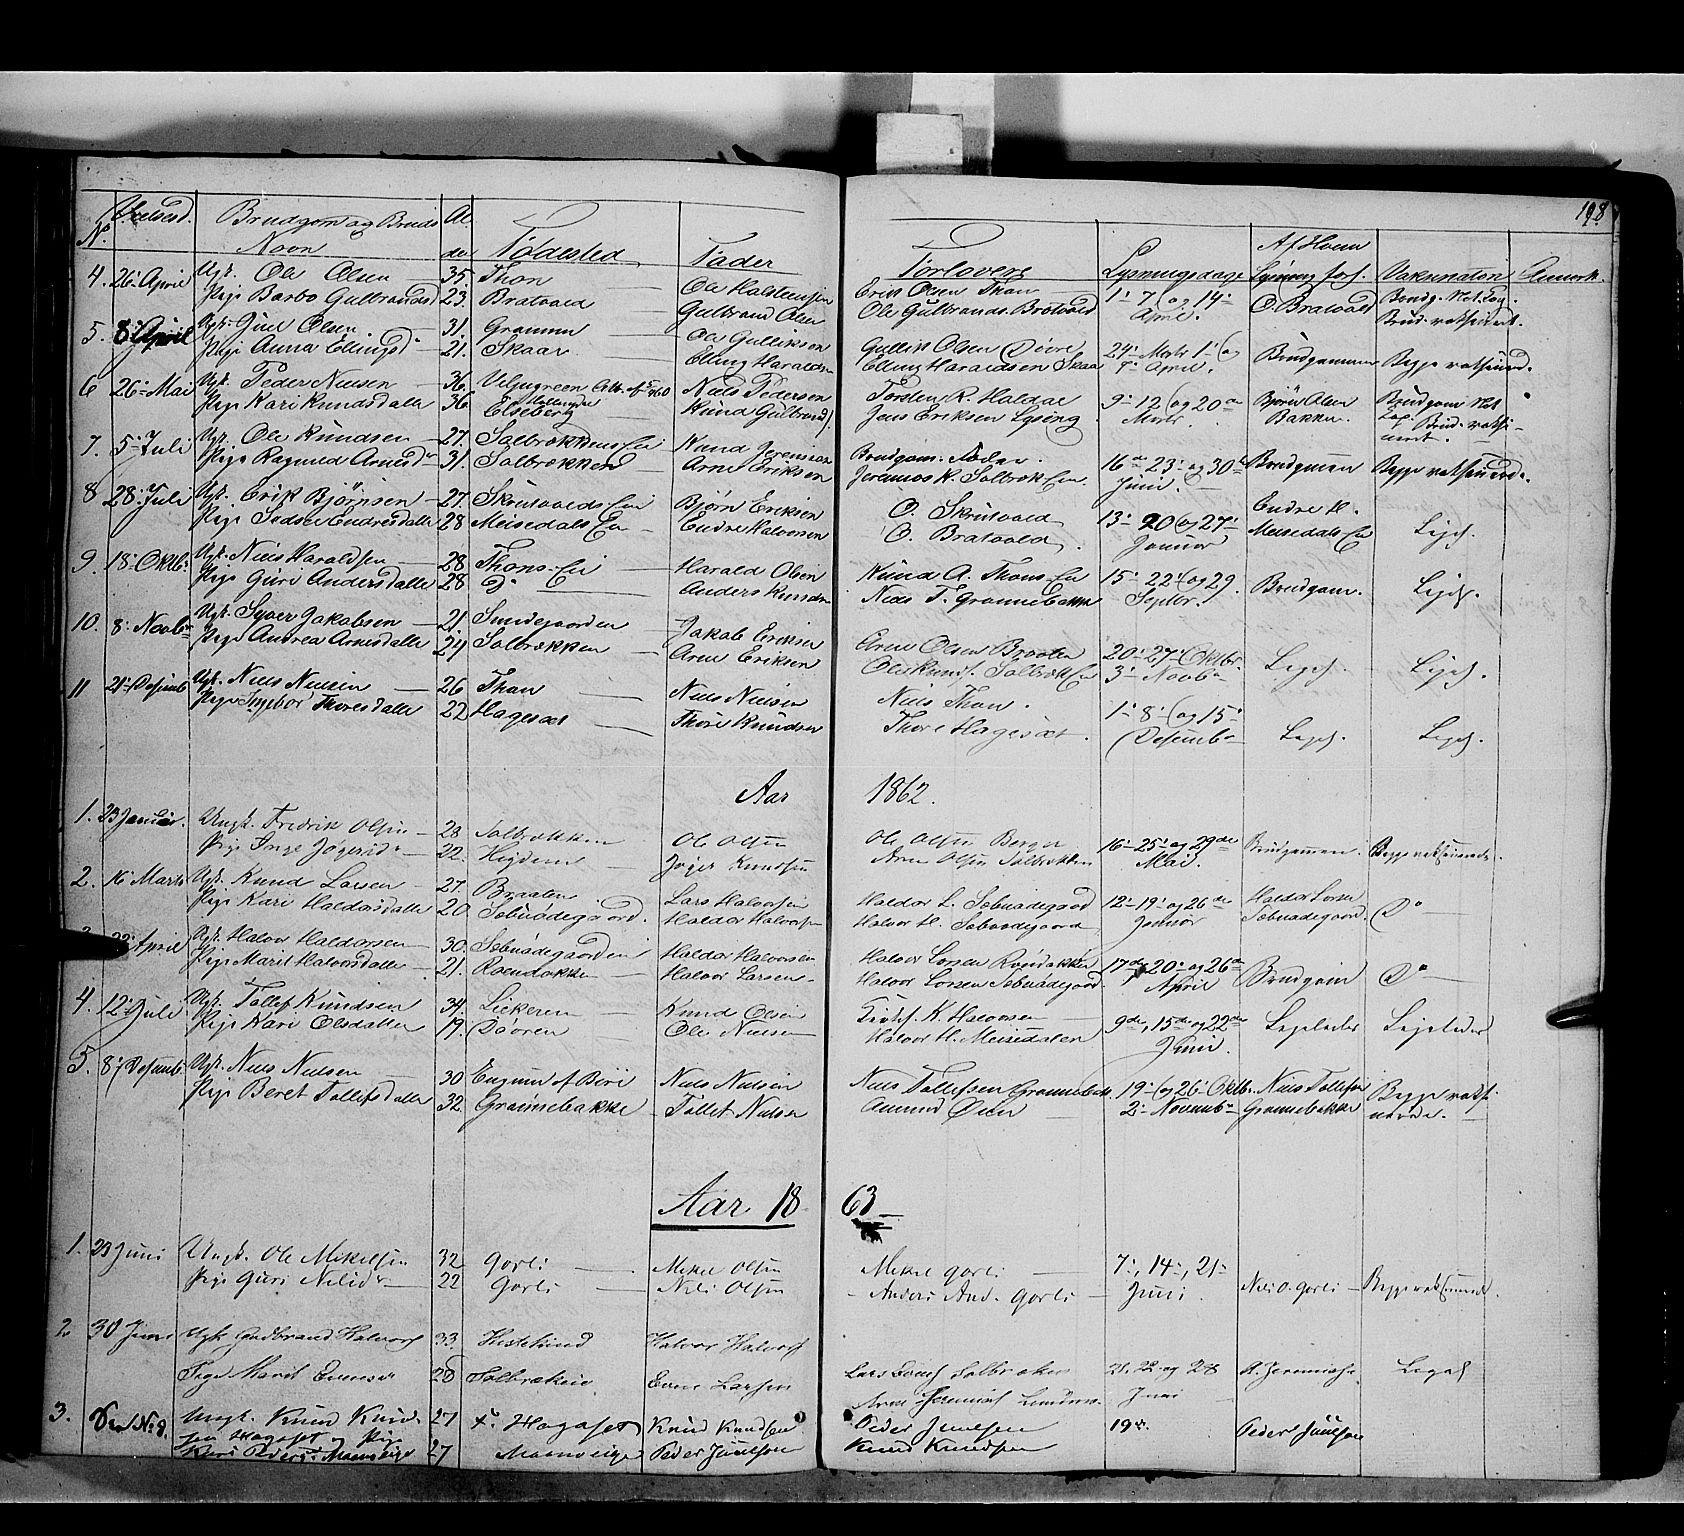 SAH, Nord-Aurdal prestekontor, Ministerialbok nr. 7, 1842-1863, s. 198